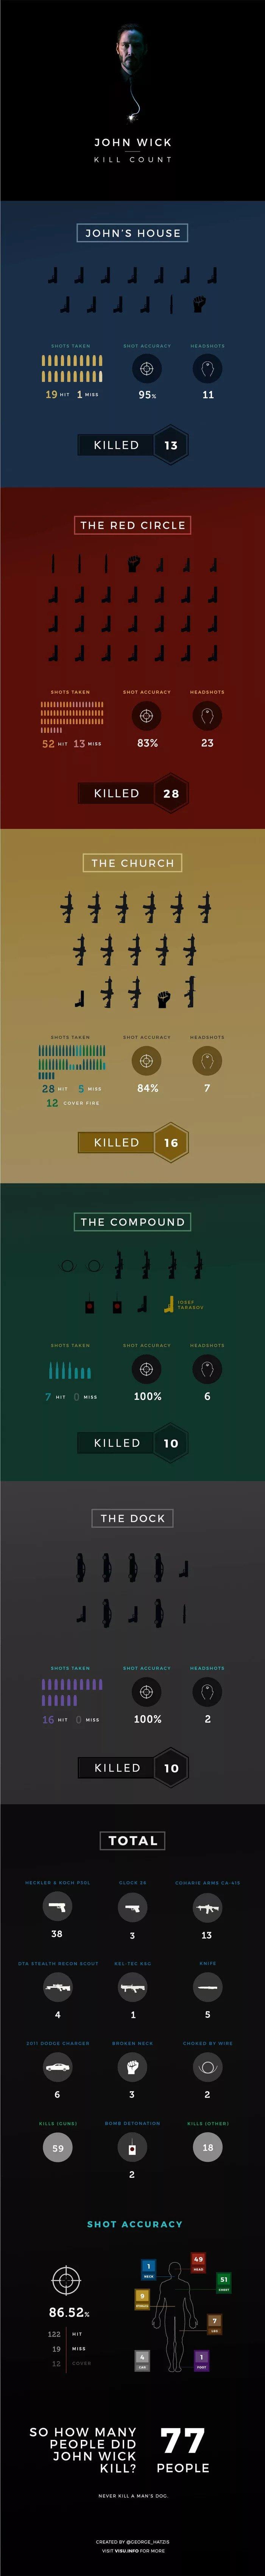 john wick kill count infographic